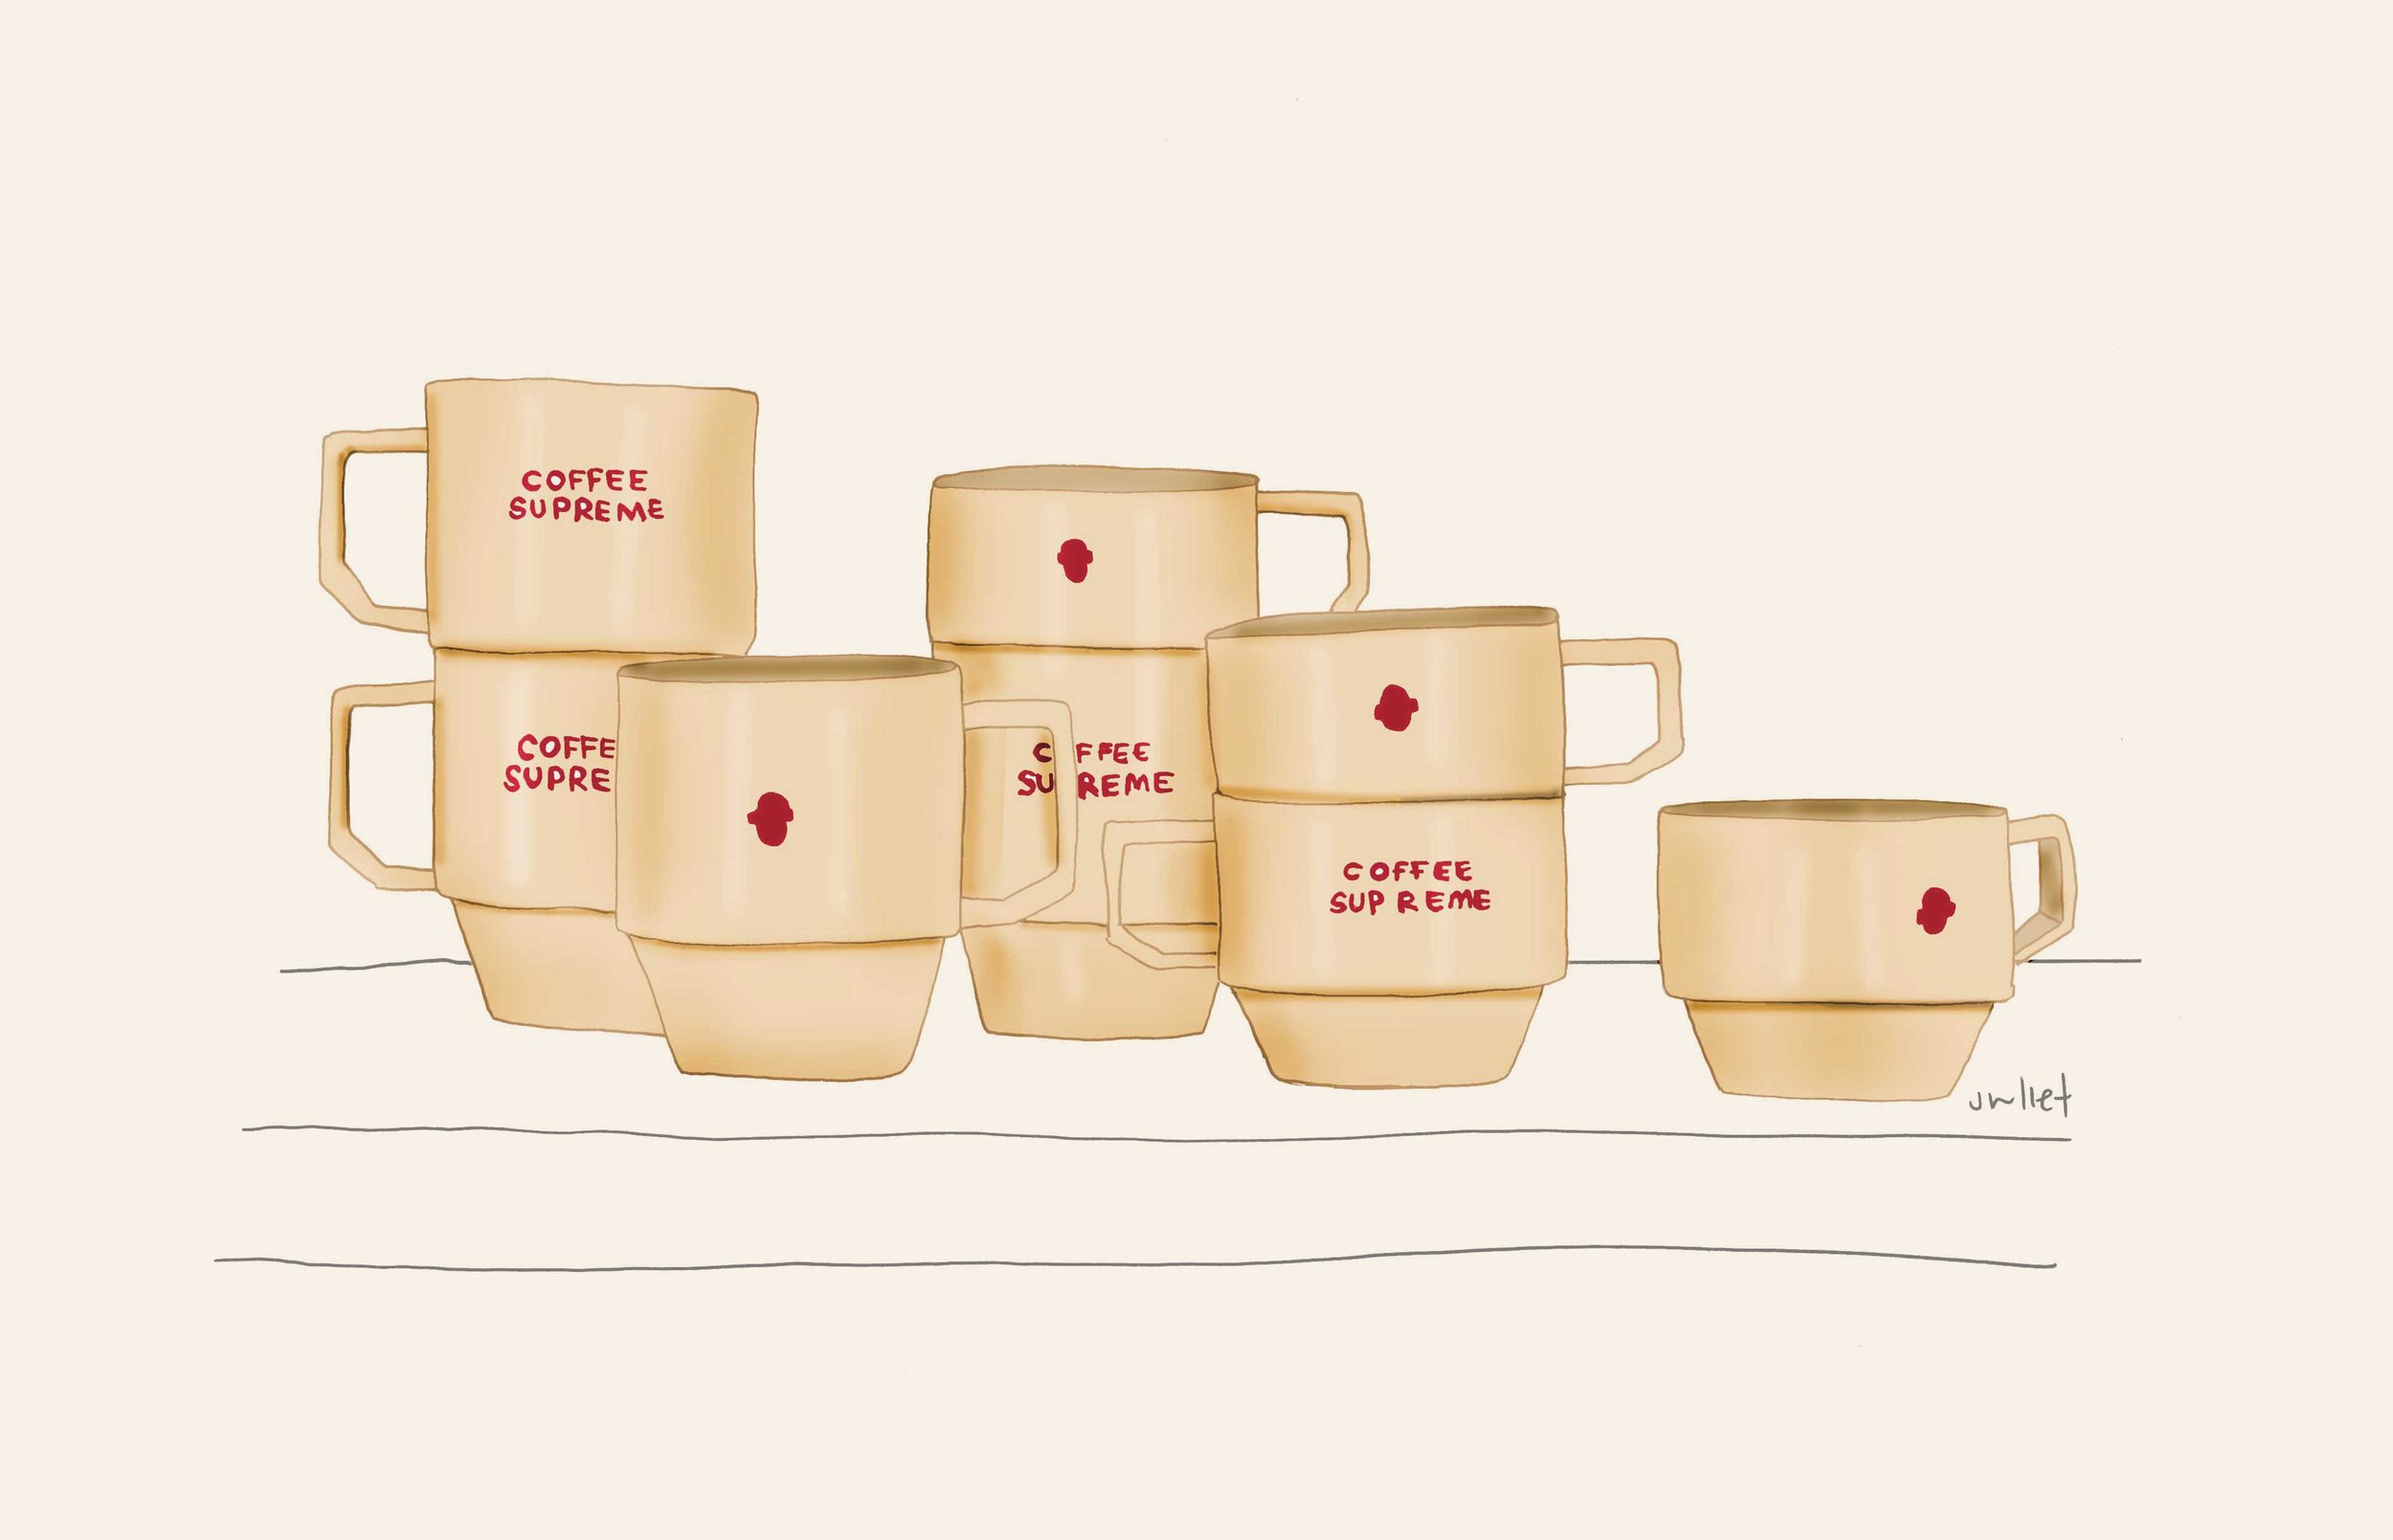 coffee supreme_the juliet report